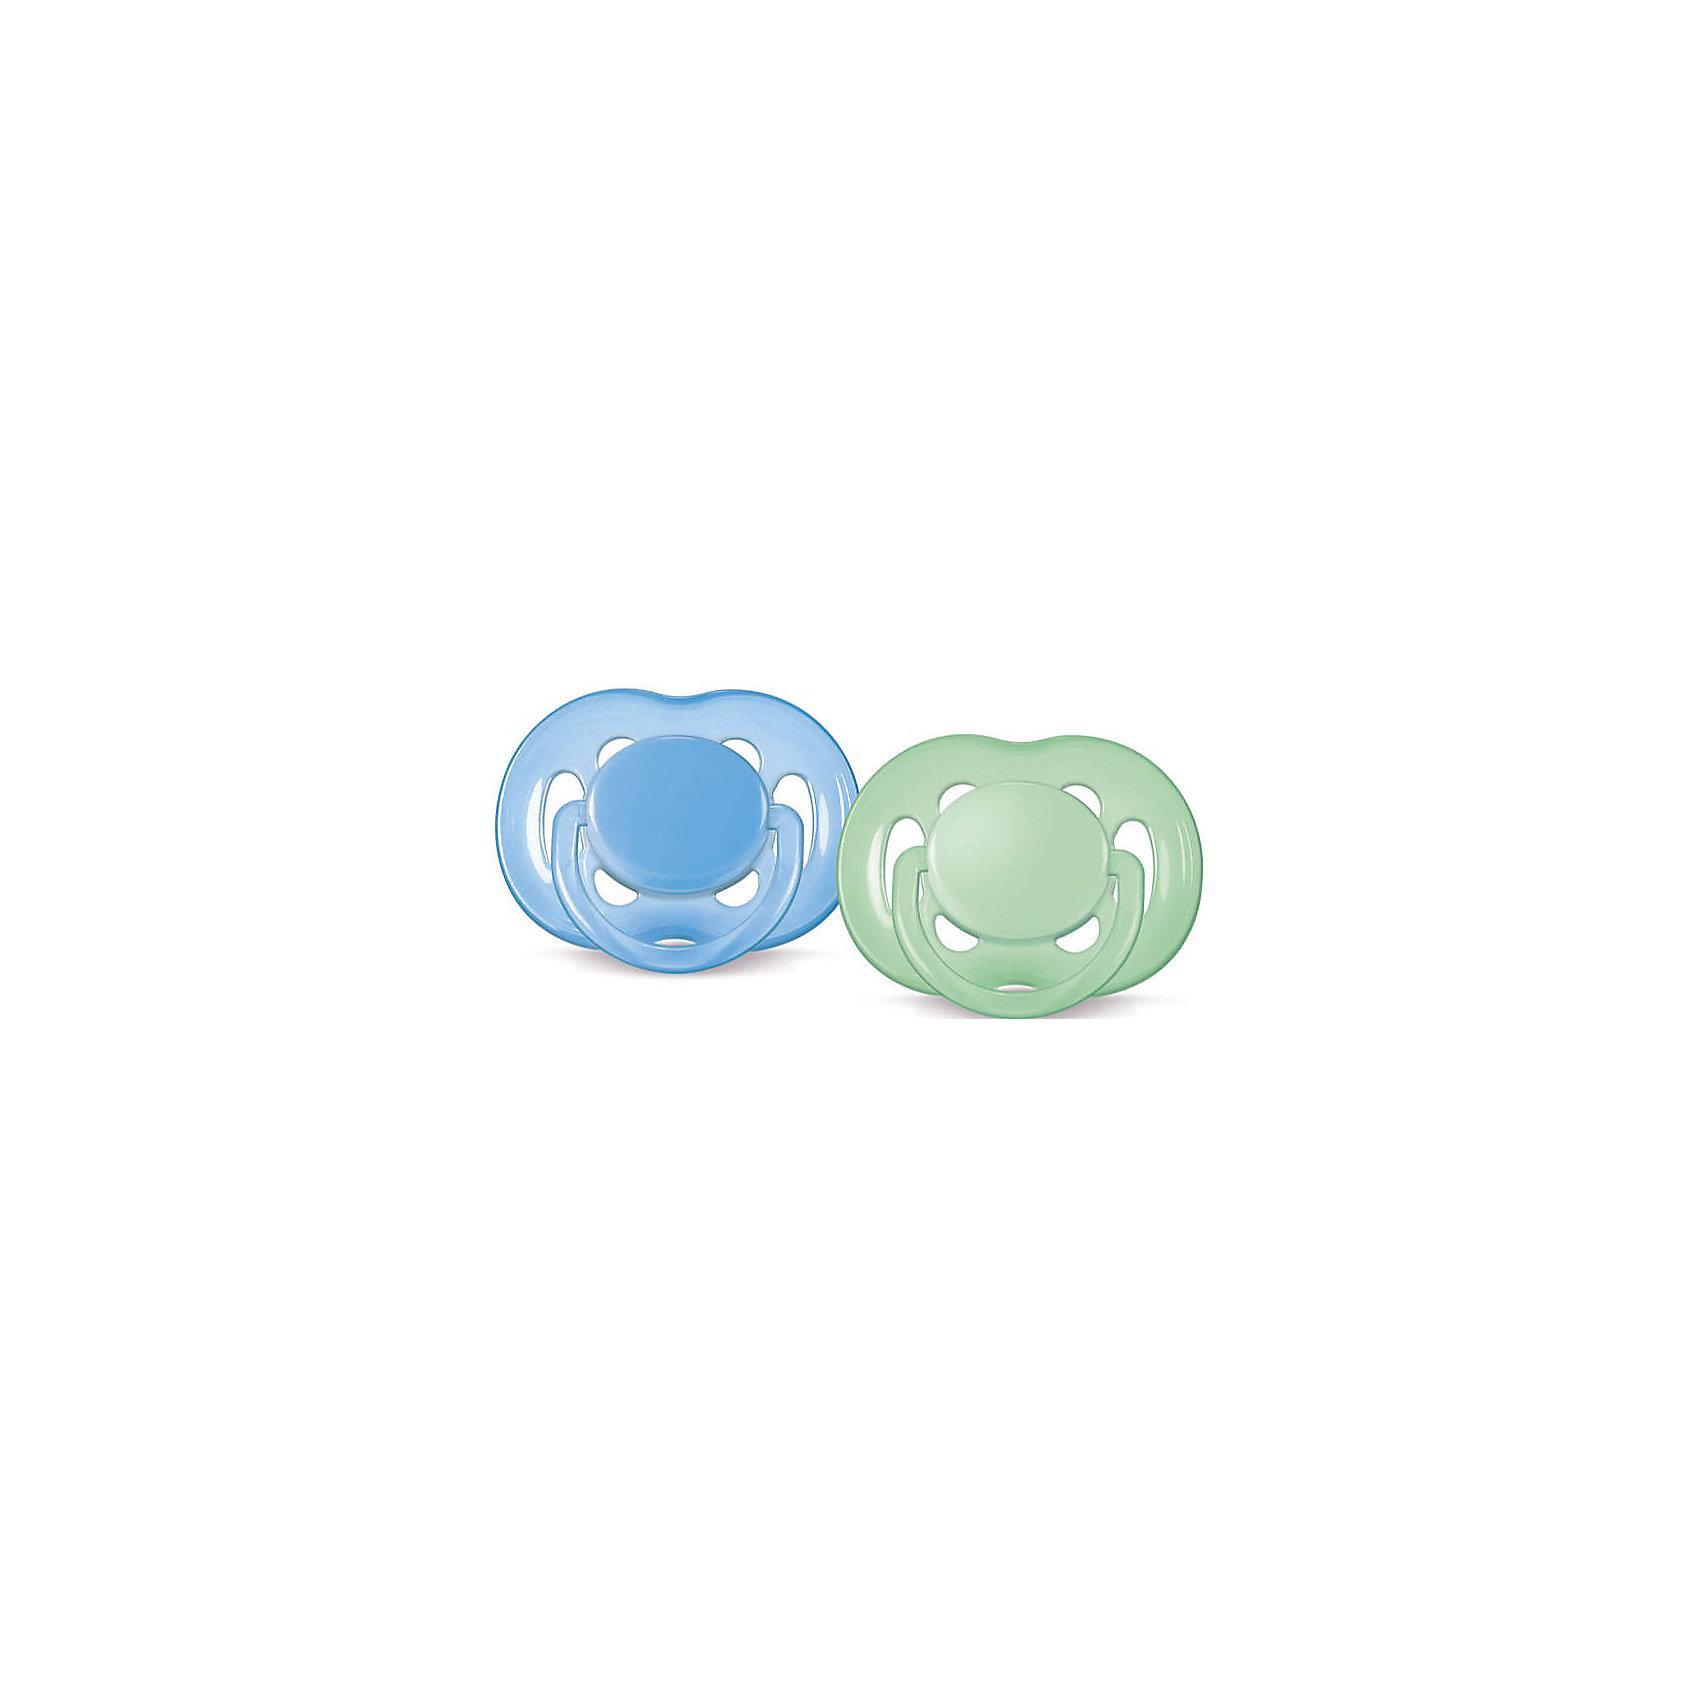 Соска-пустышка 6-18 мес, 2 шт., Philips Avent, зеленый/голубой